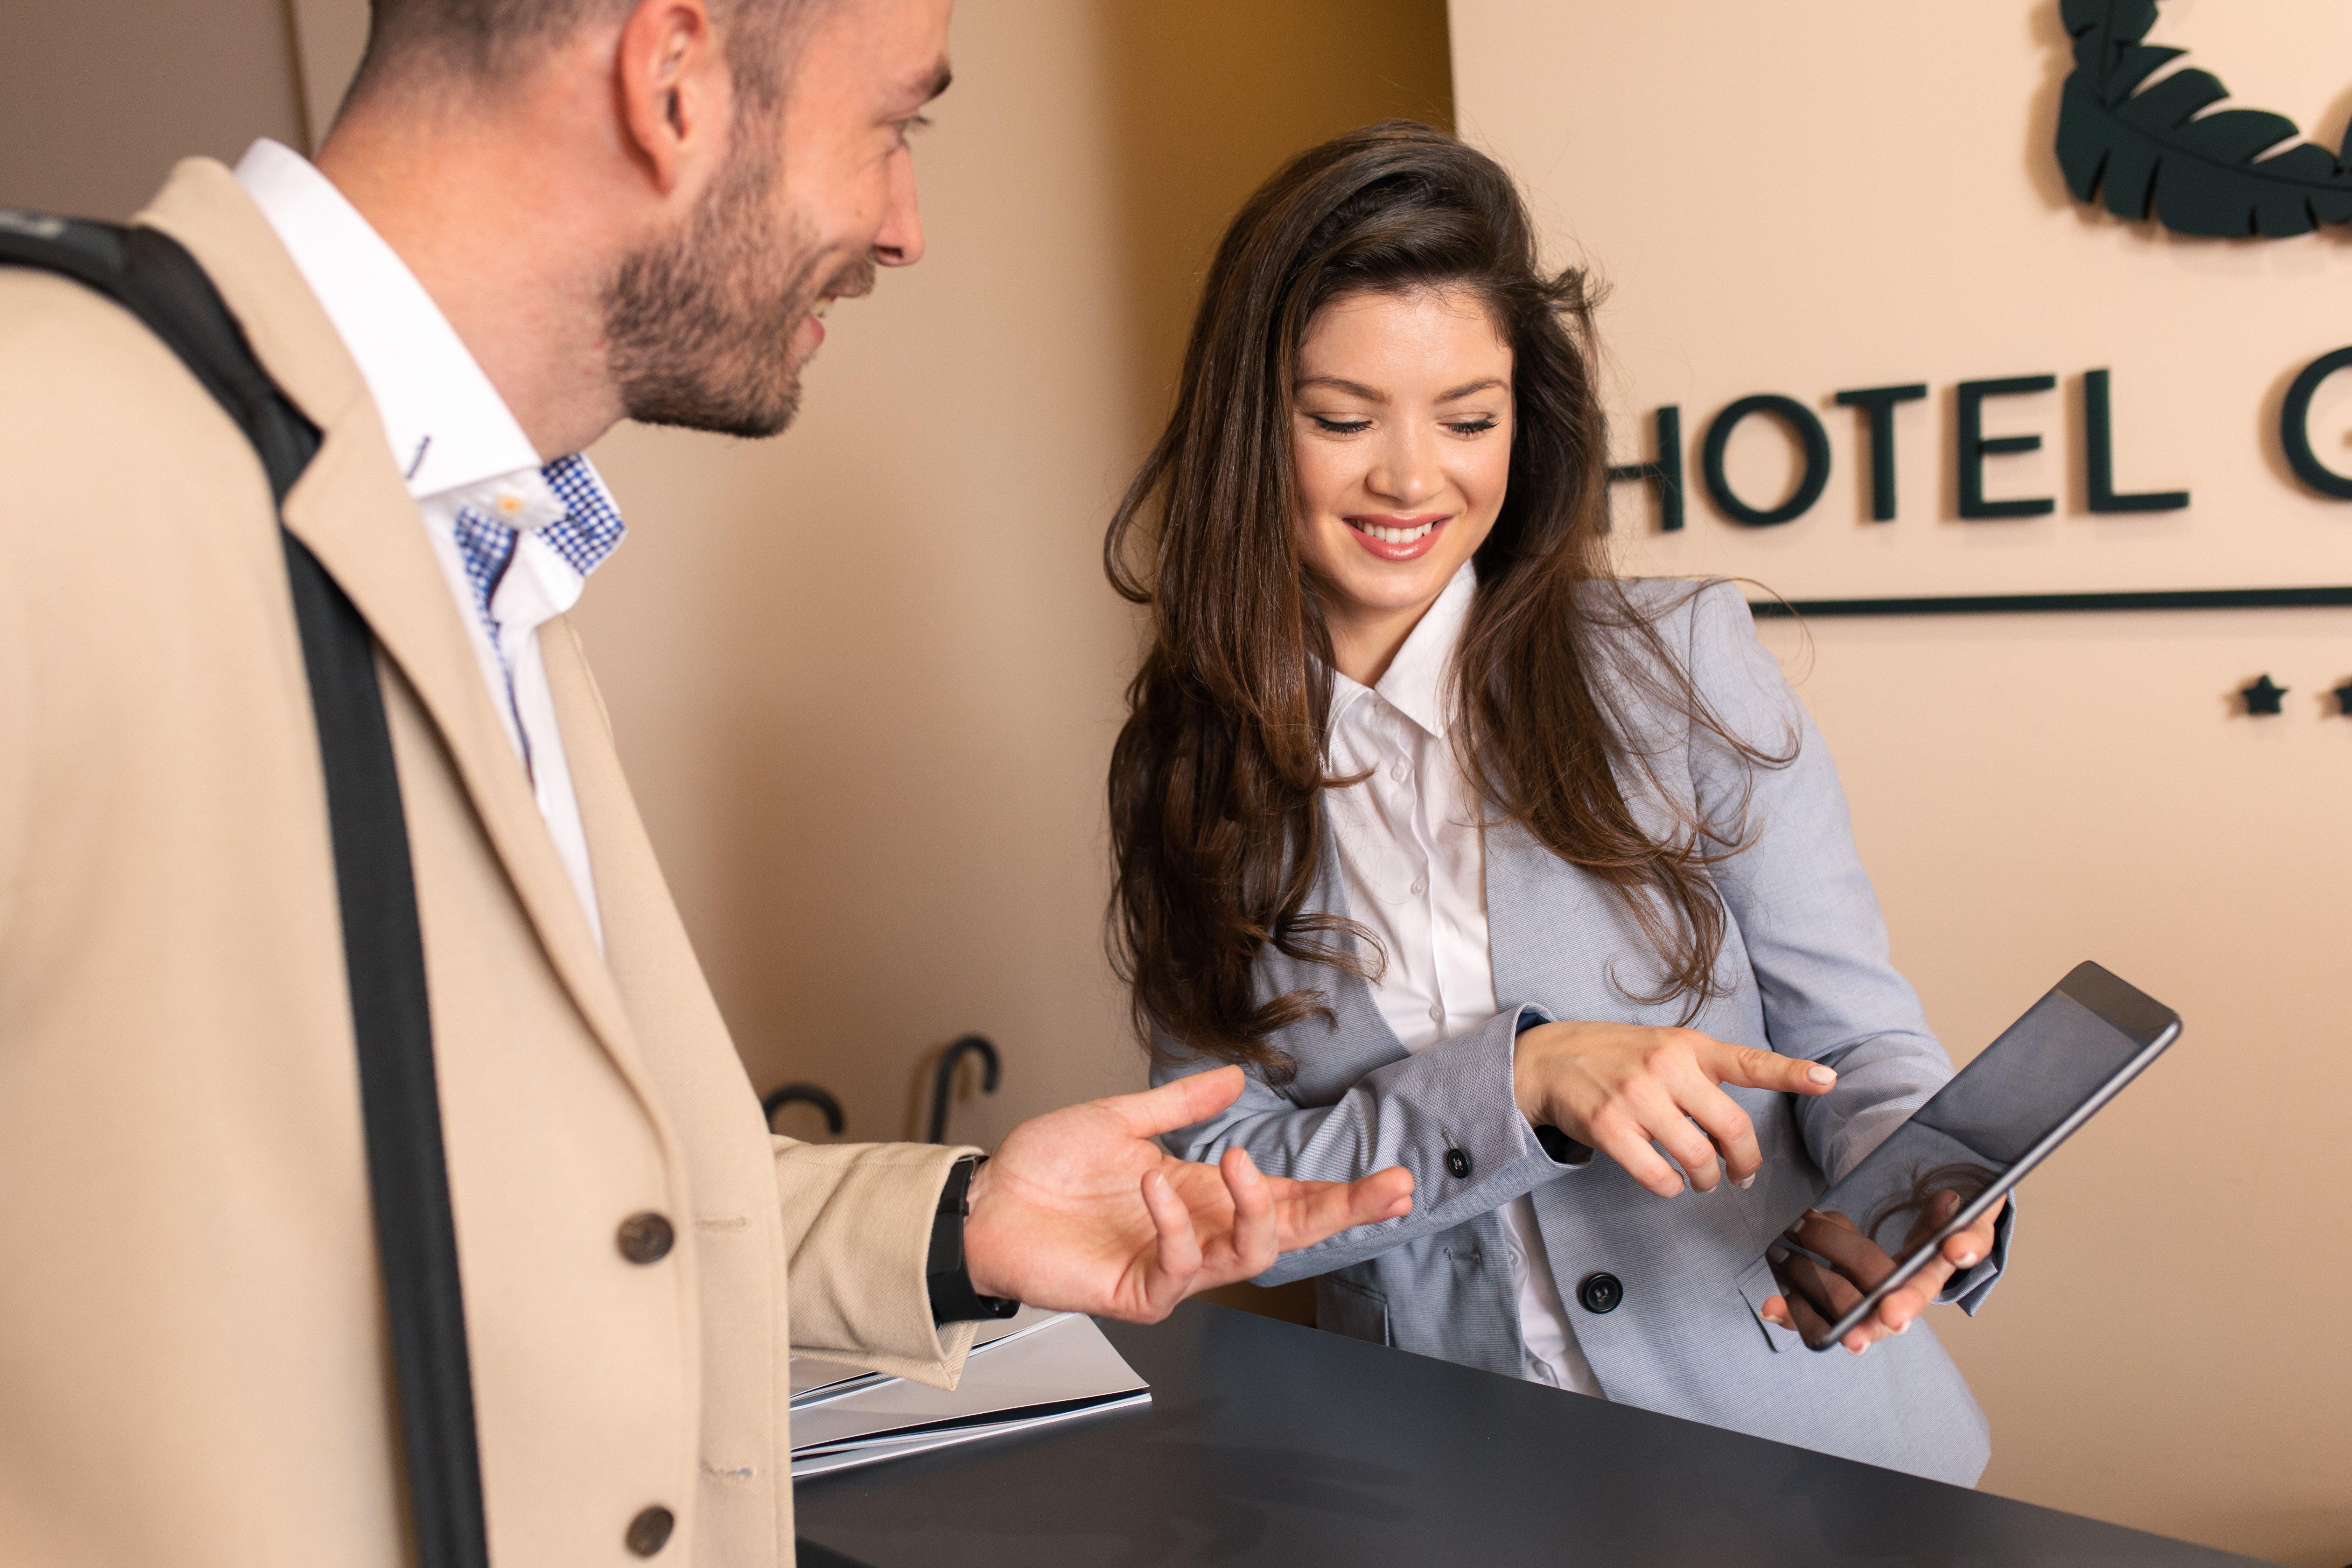 hotel_ipad_check_in